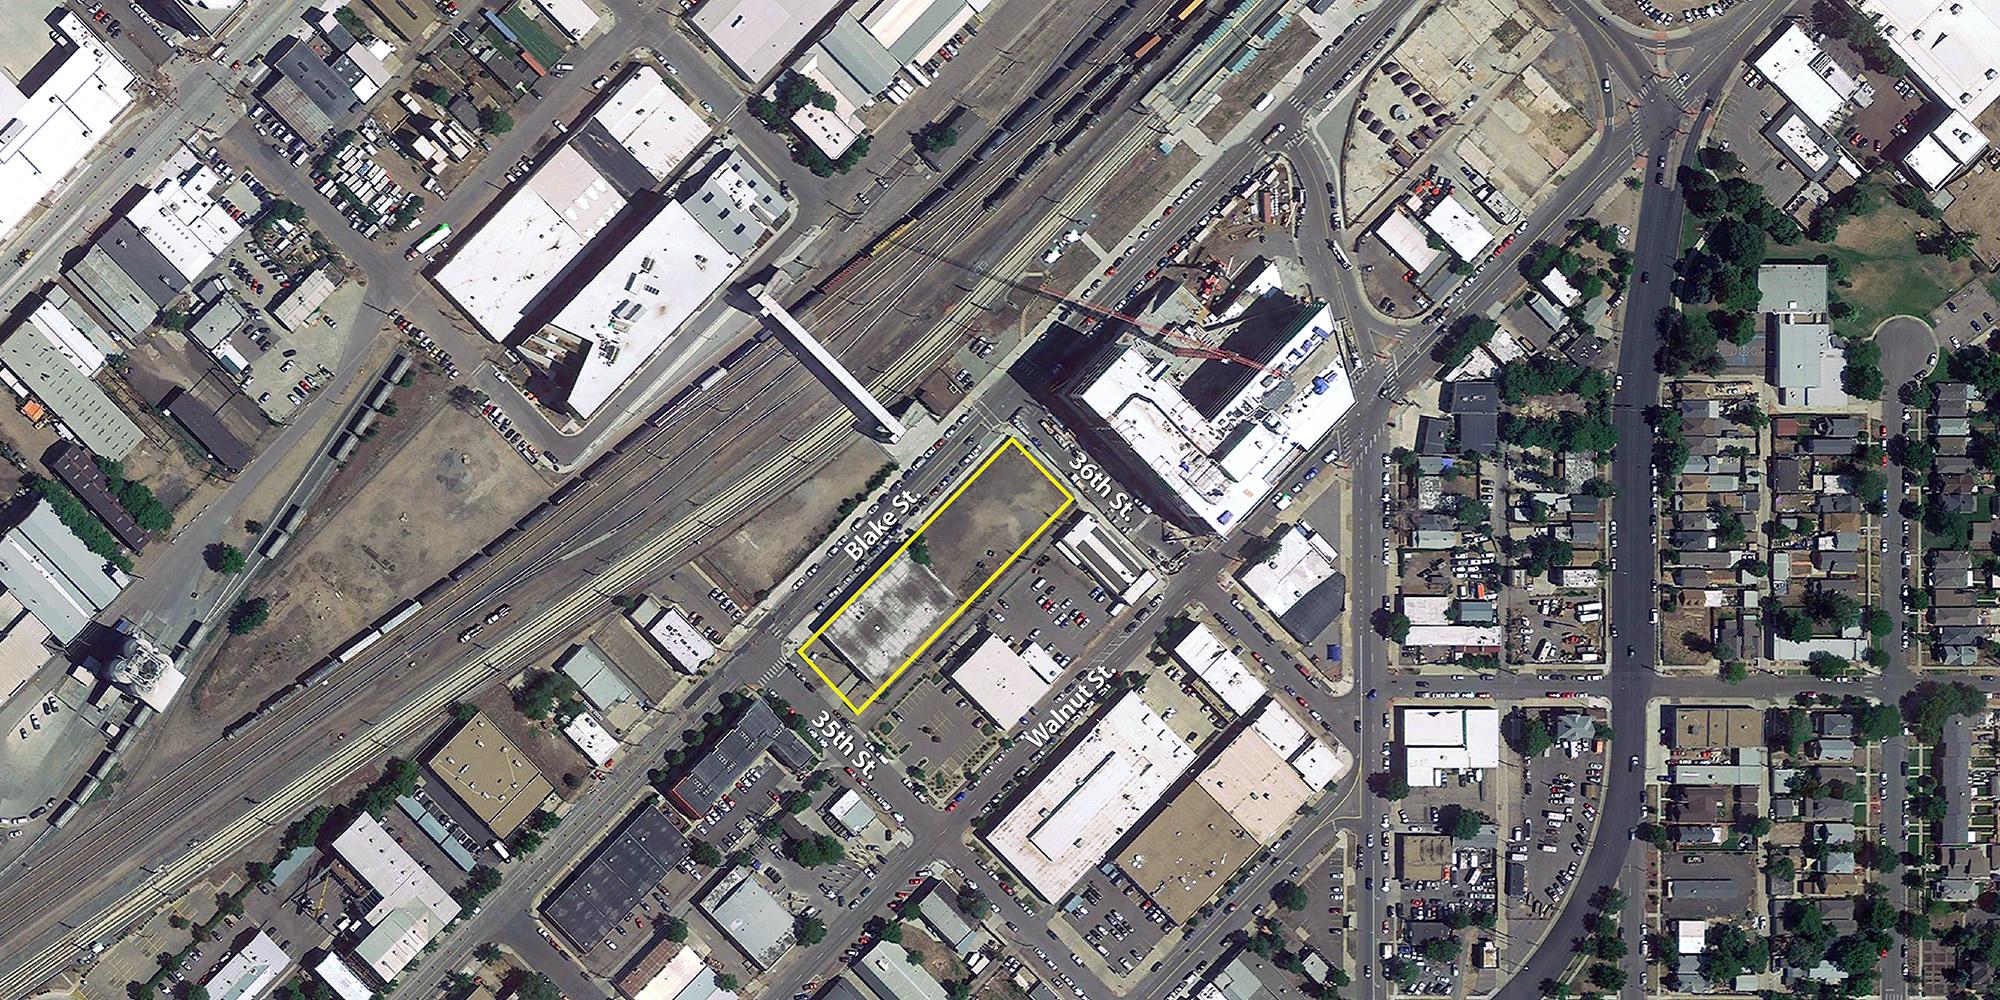 T3 RiNo location, base aerial courtesy of Google Earth